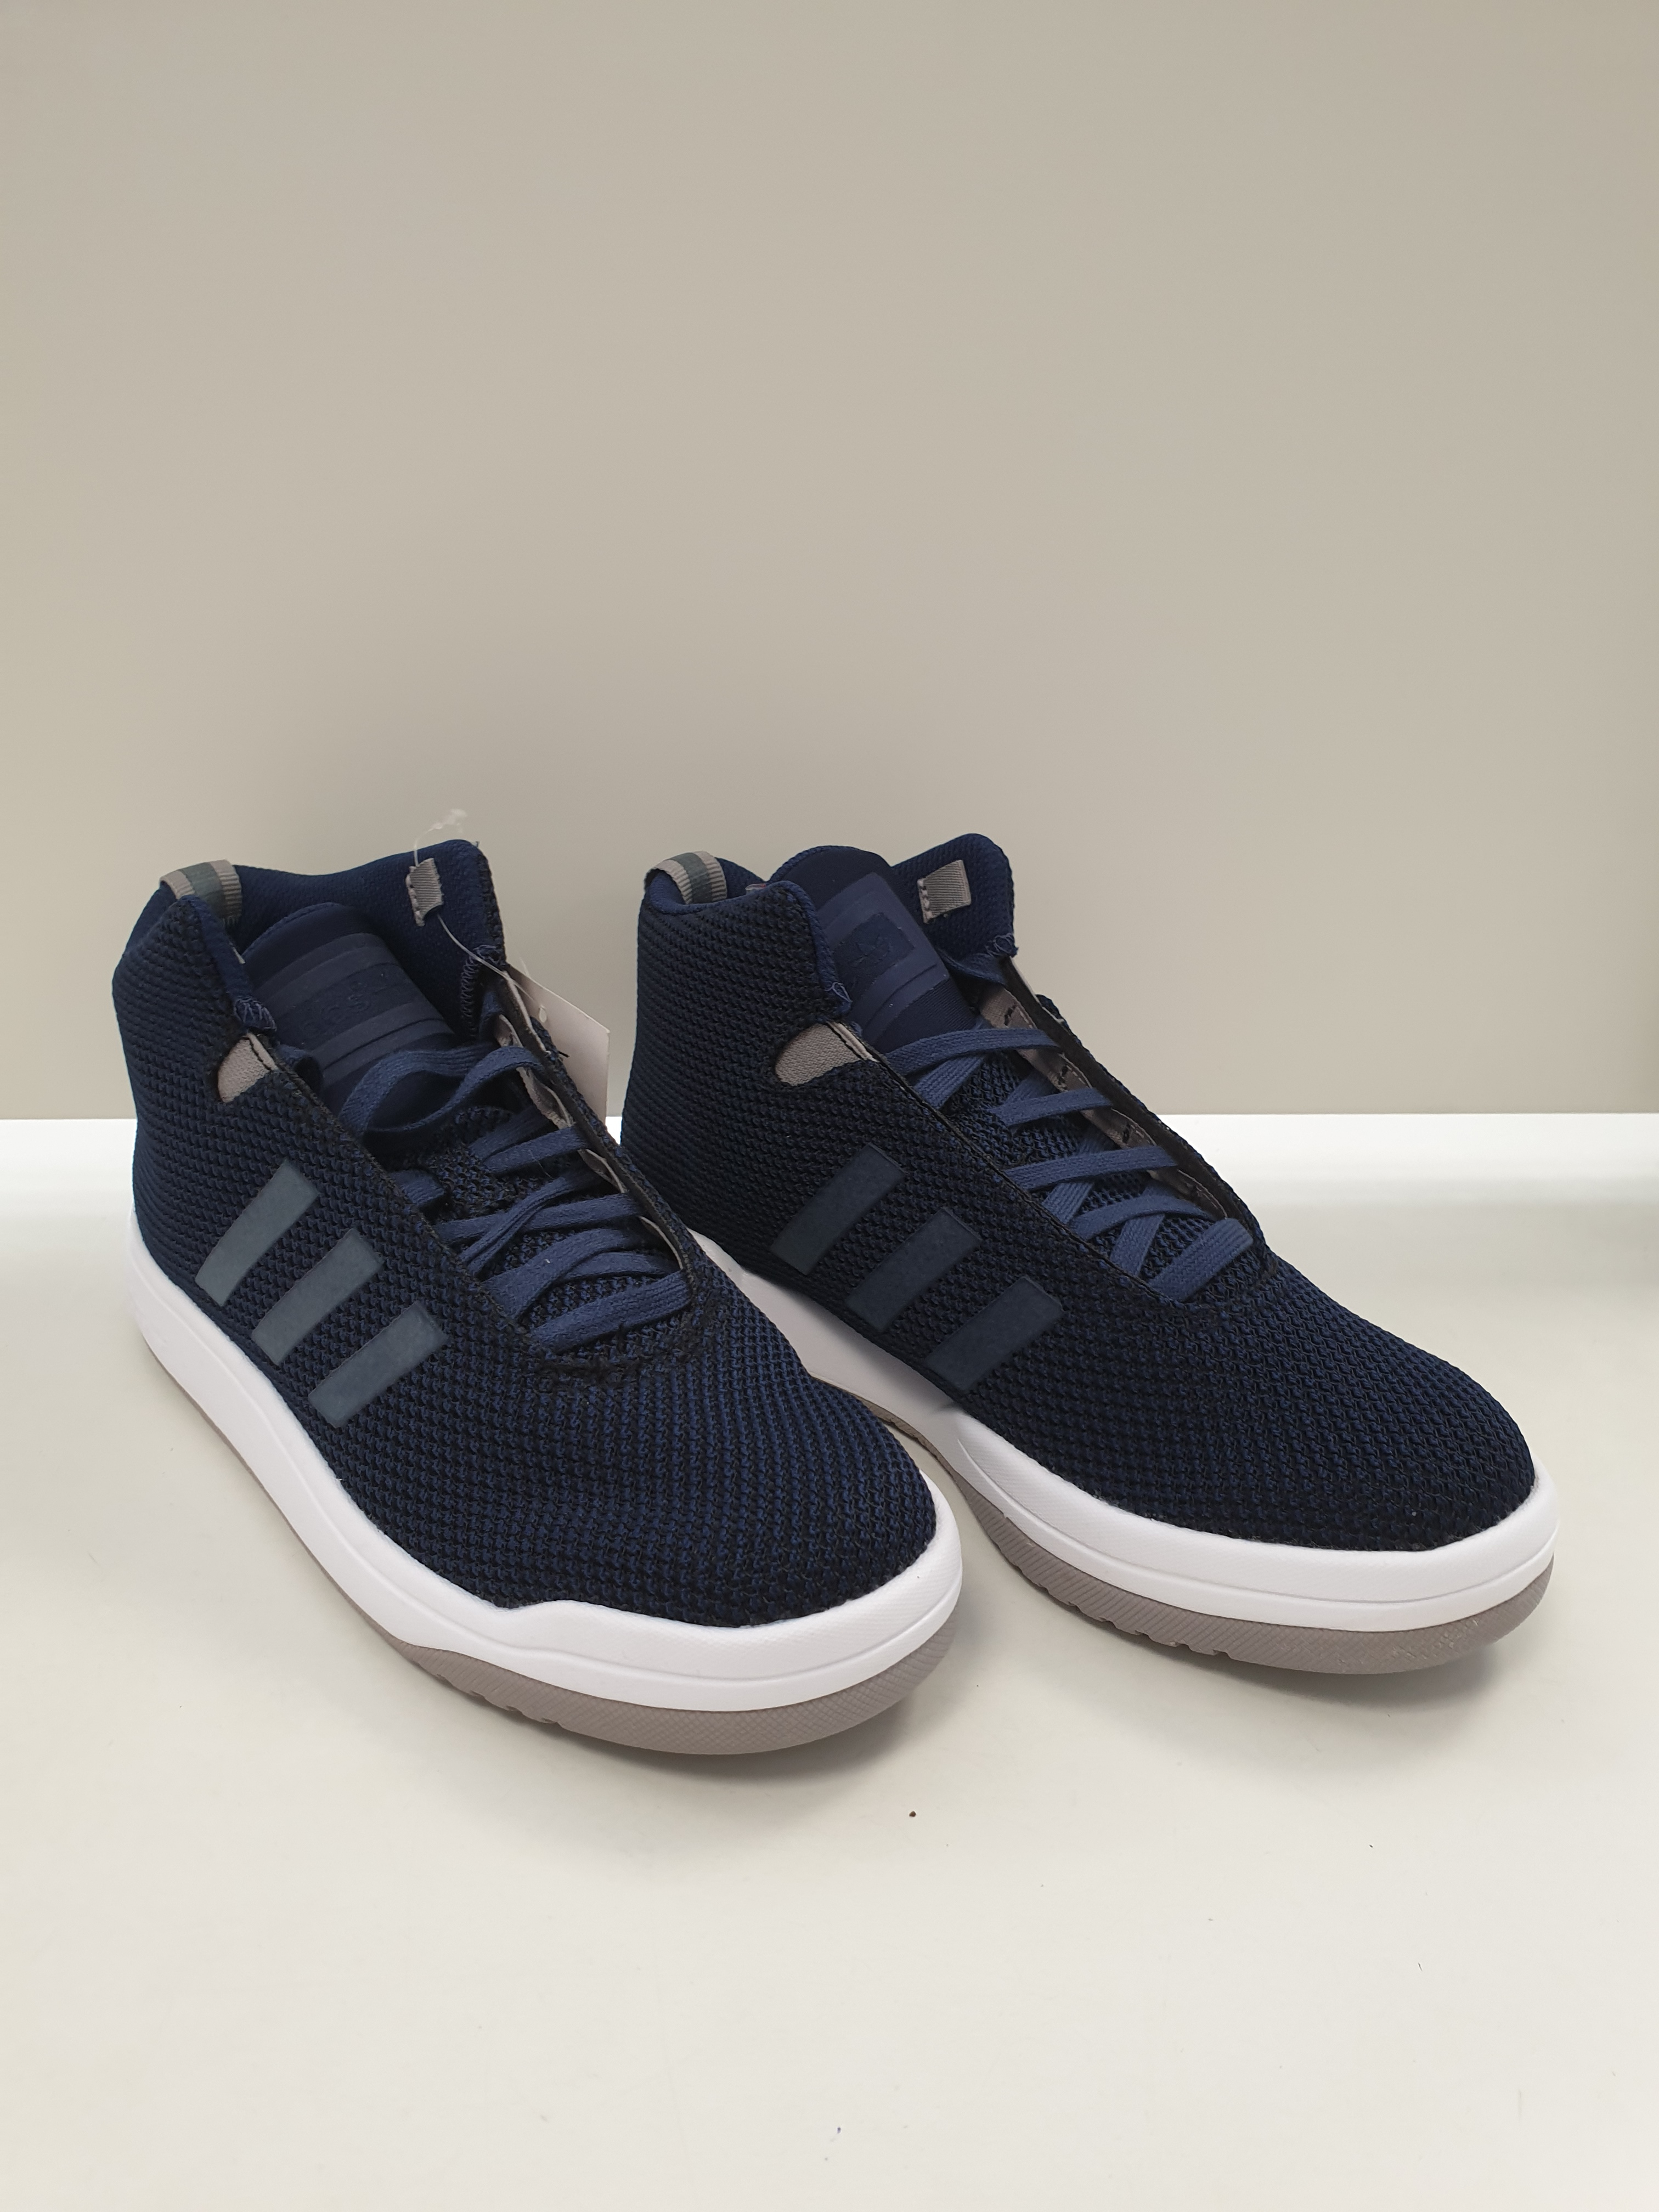 Scarpa ADIDAS alta colore blu